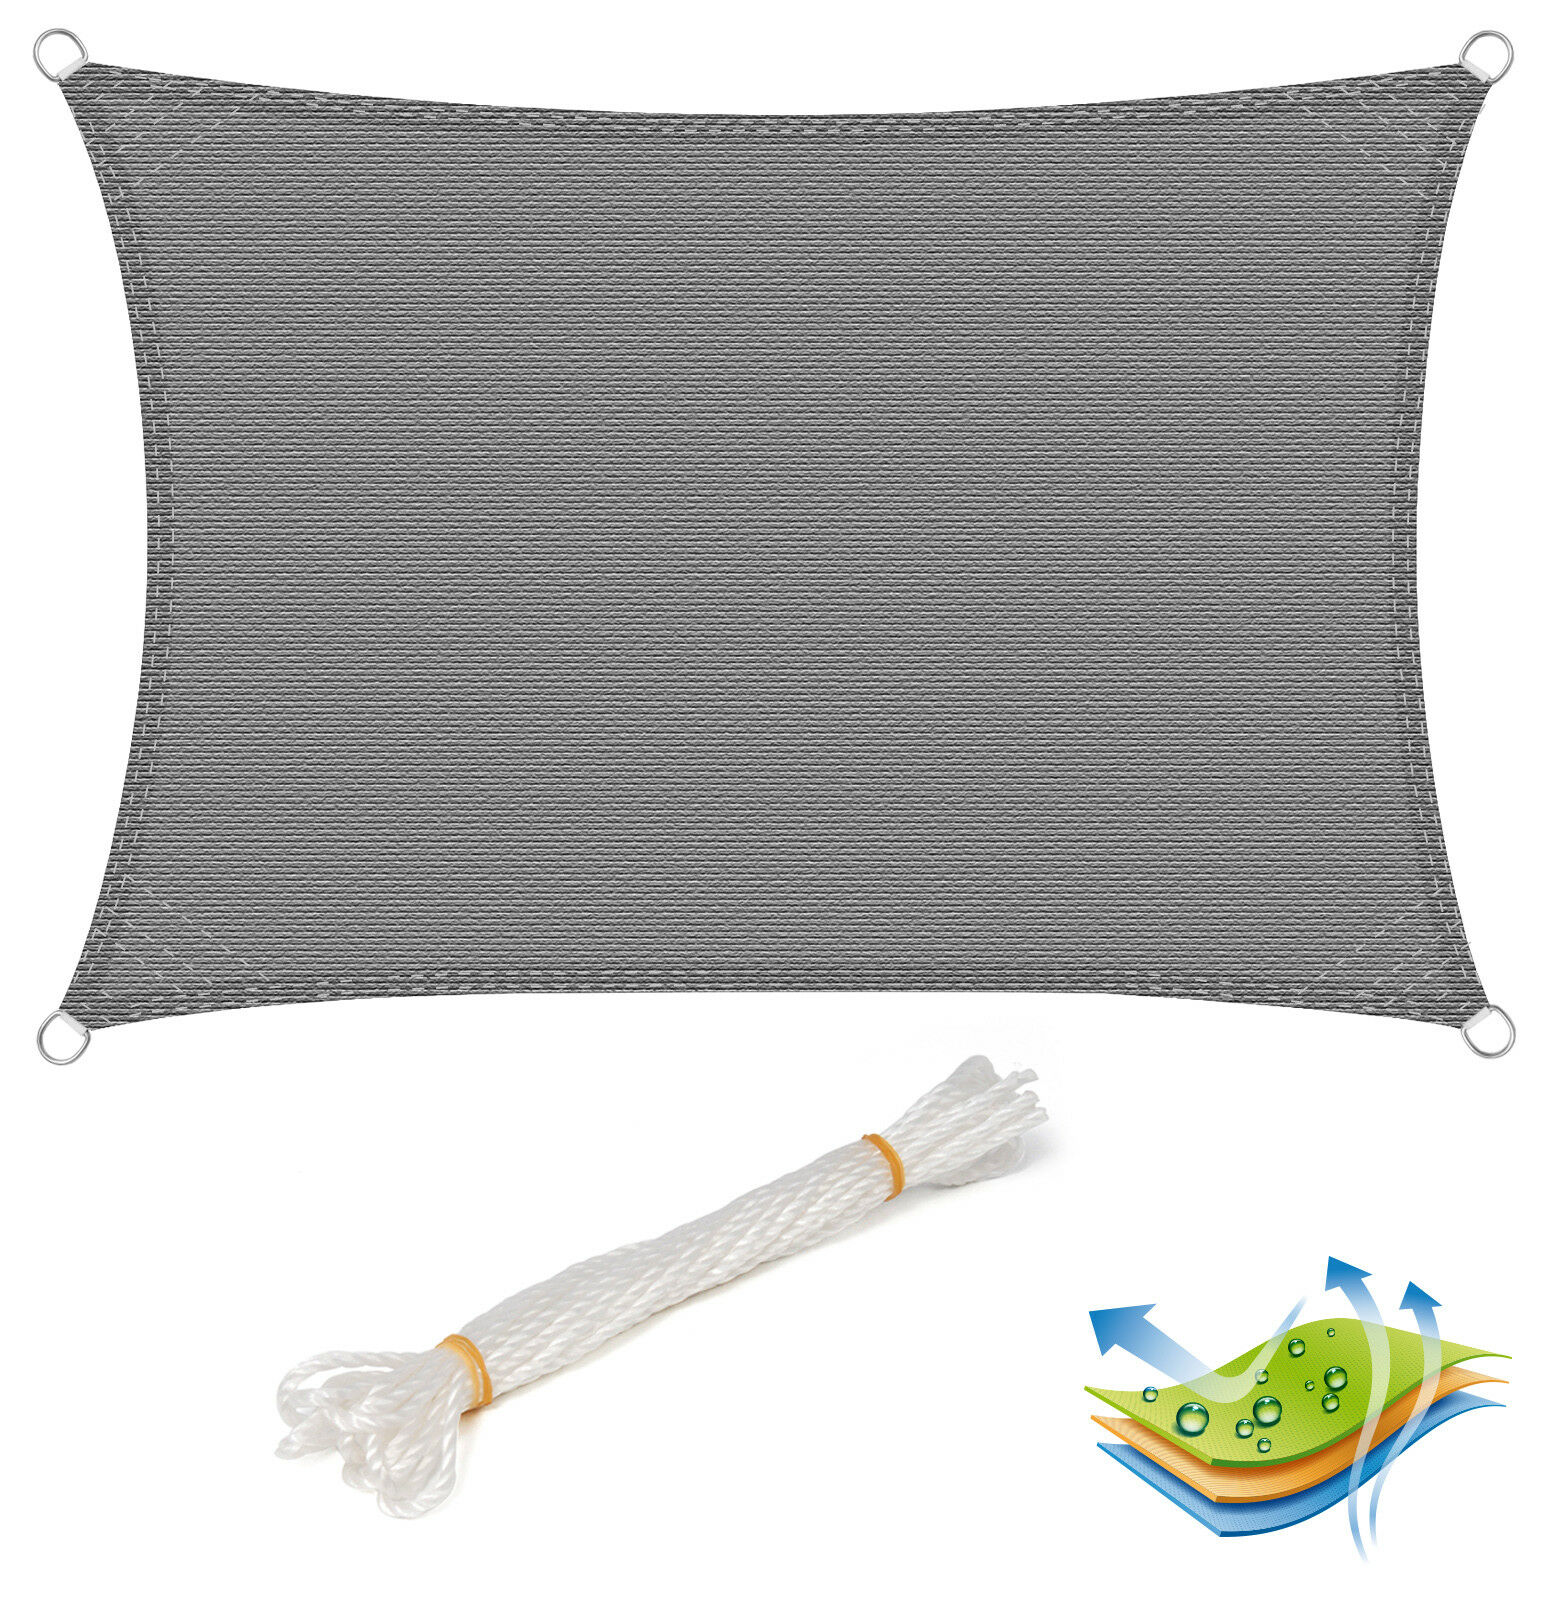 Sonnensegel Rechteck Sonnenschutz Sichtschutz UV-Schutz Atmungsaktiv HDPE Grau